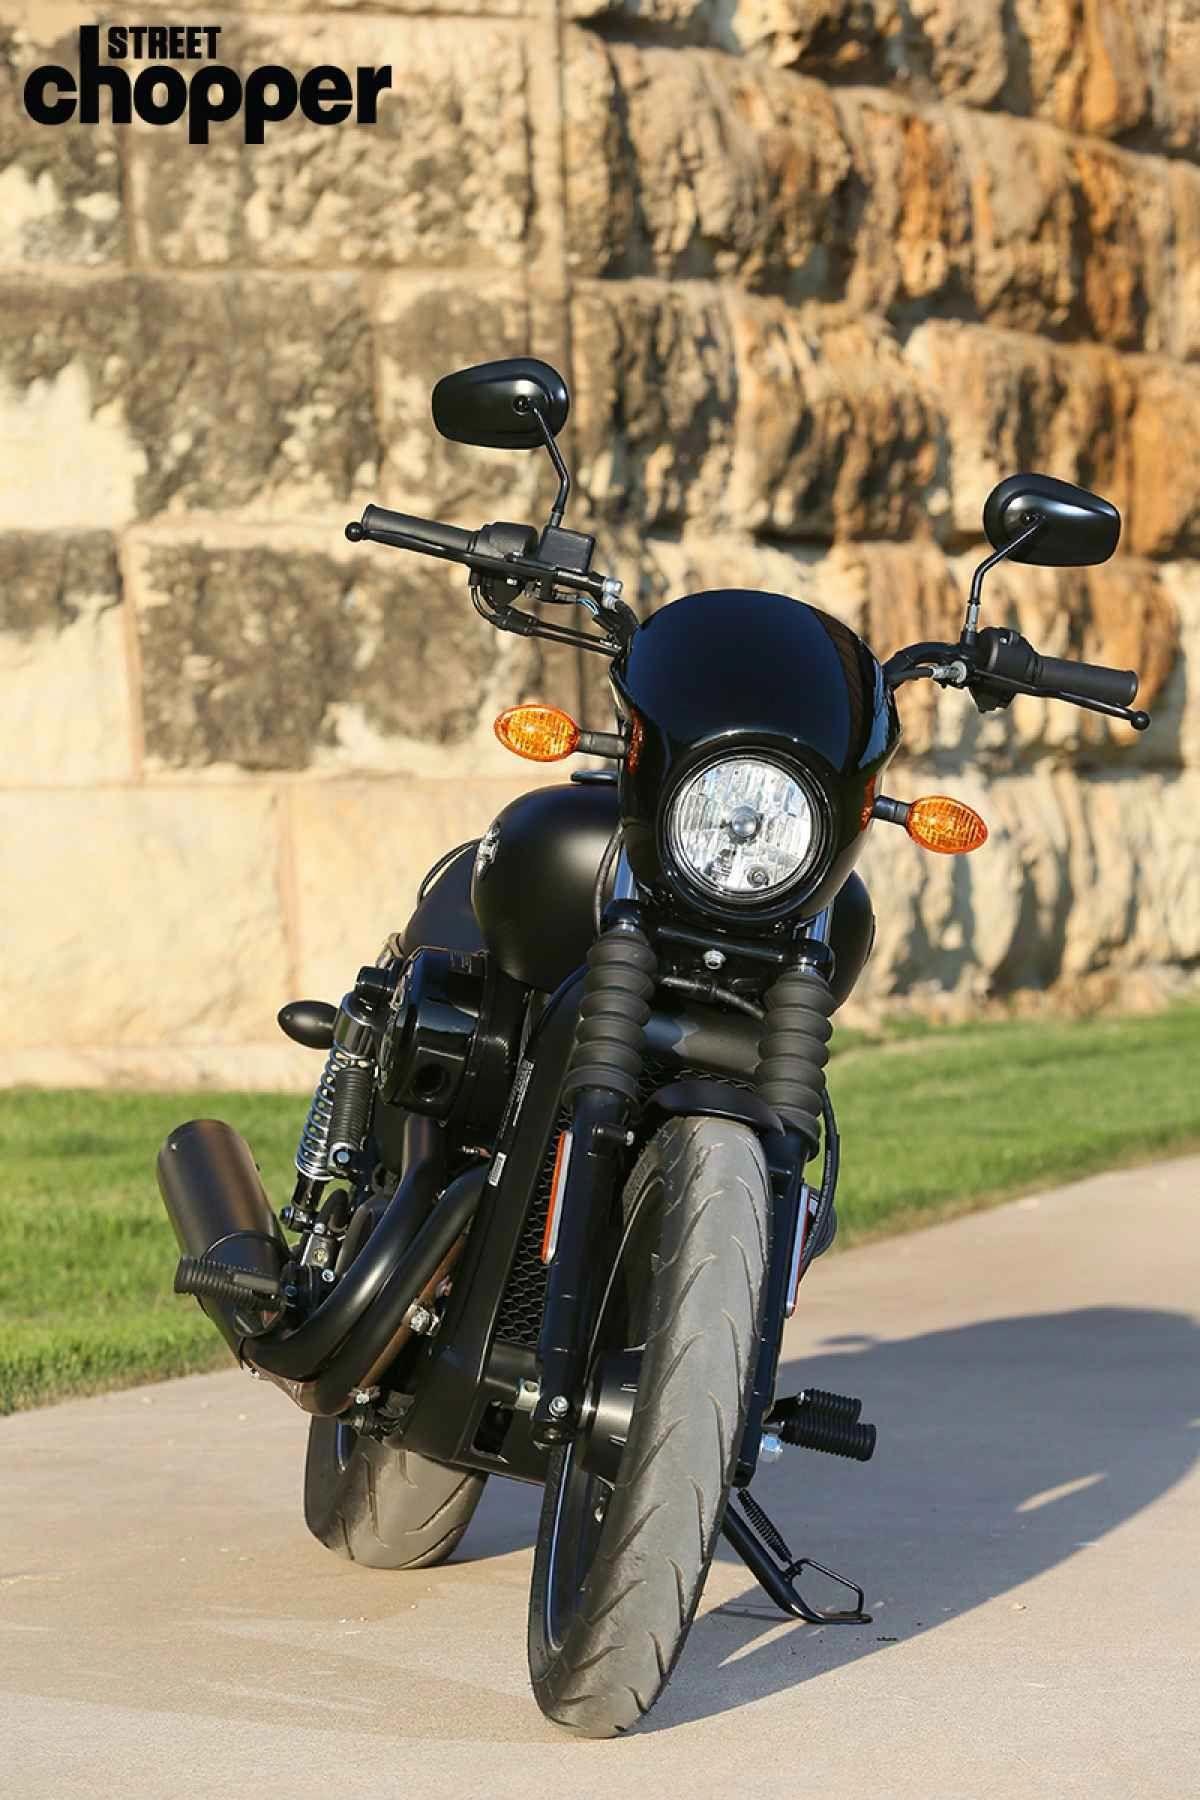 First Ride Review Harley Davidson Street 750 Street Chopper